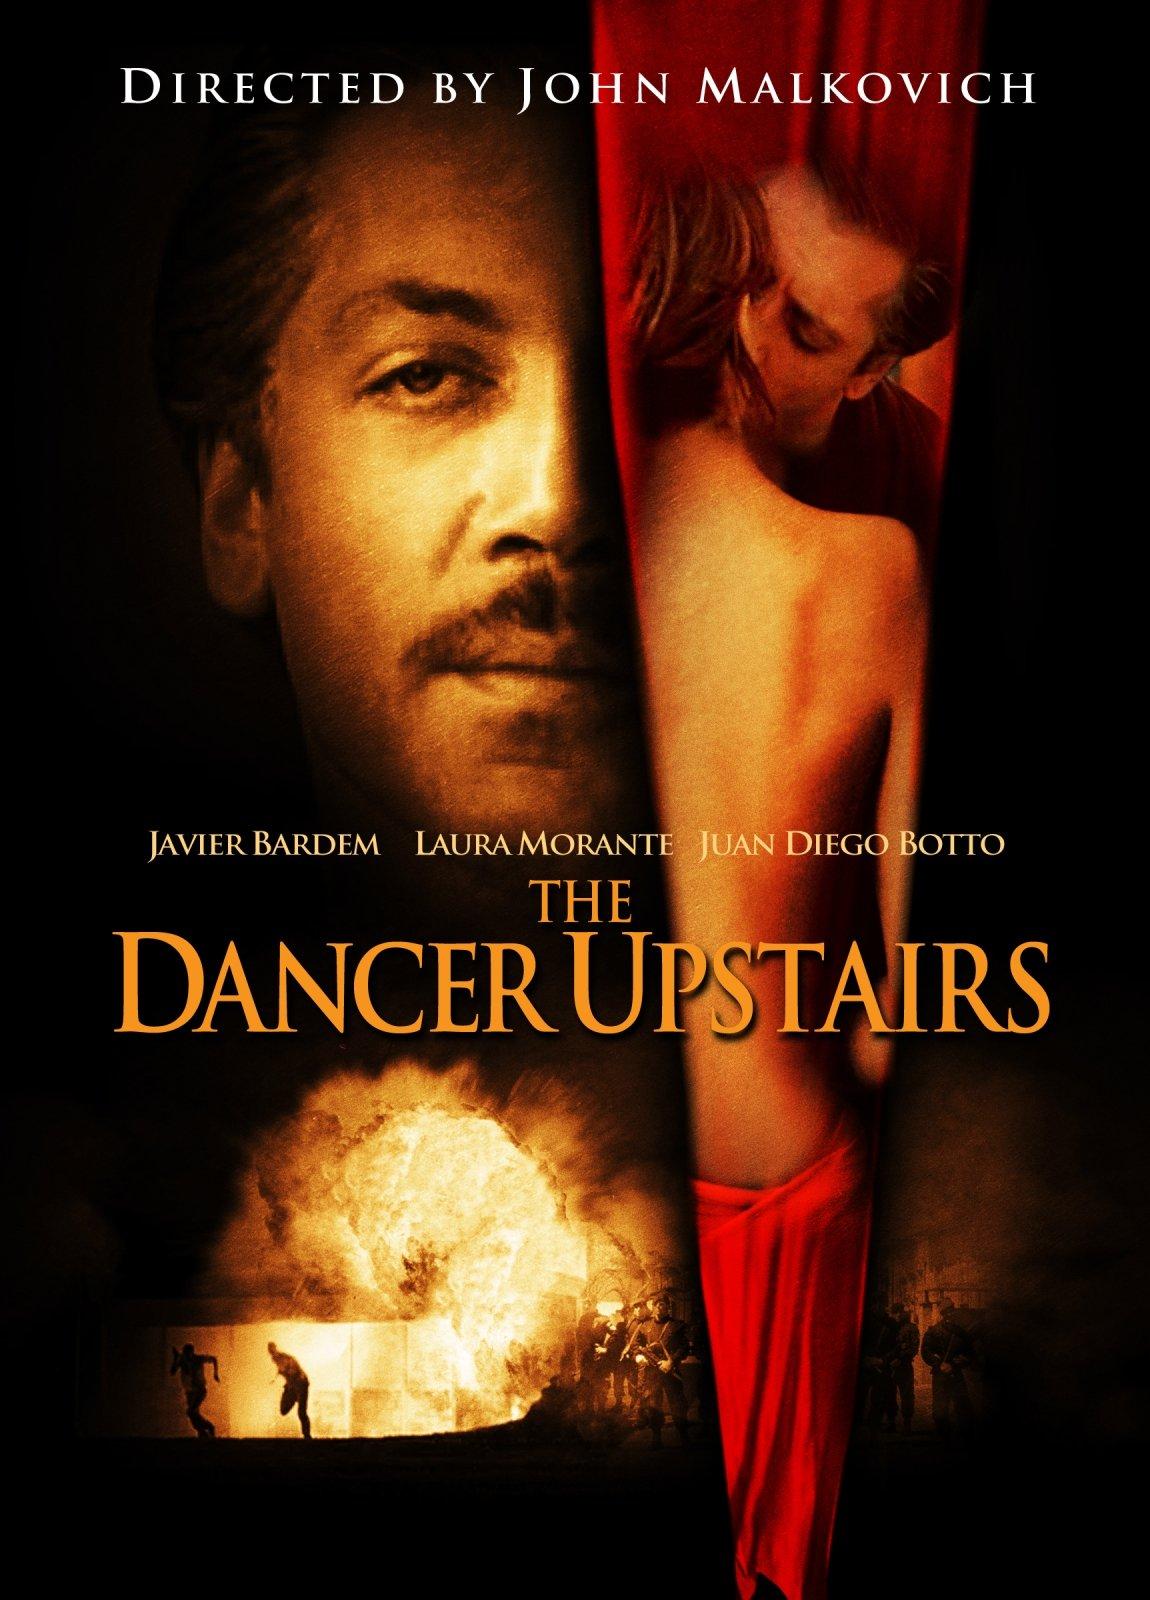 The Dancer Upstairs kapak